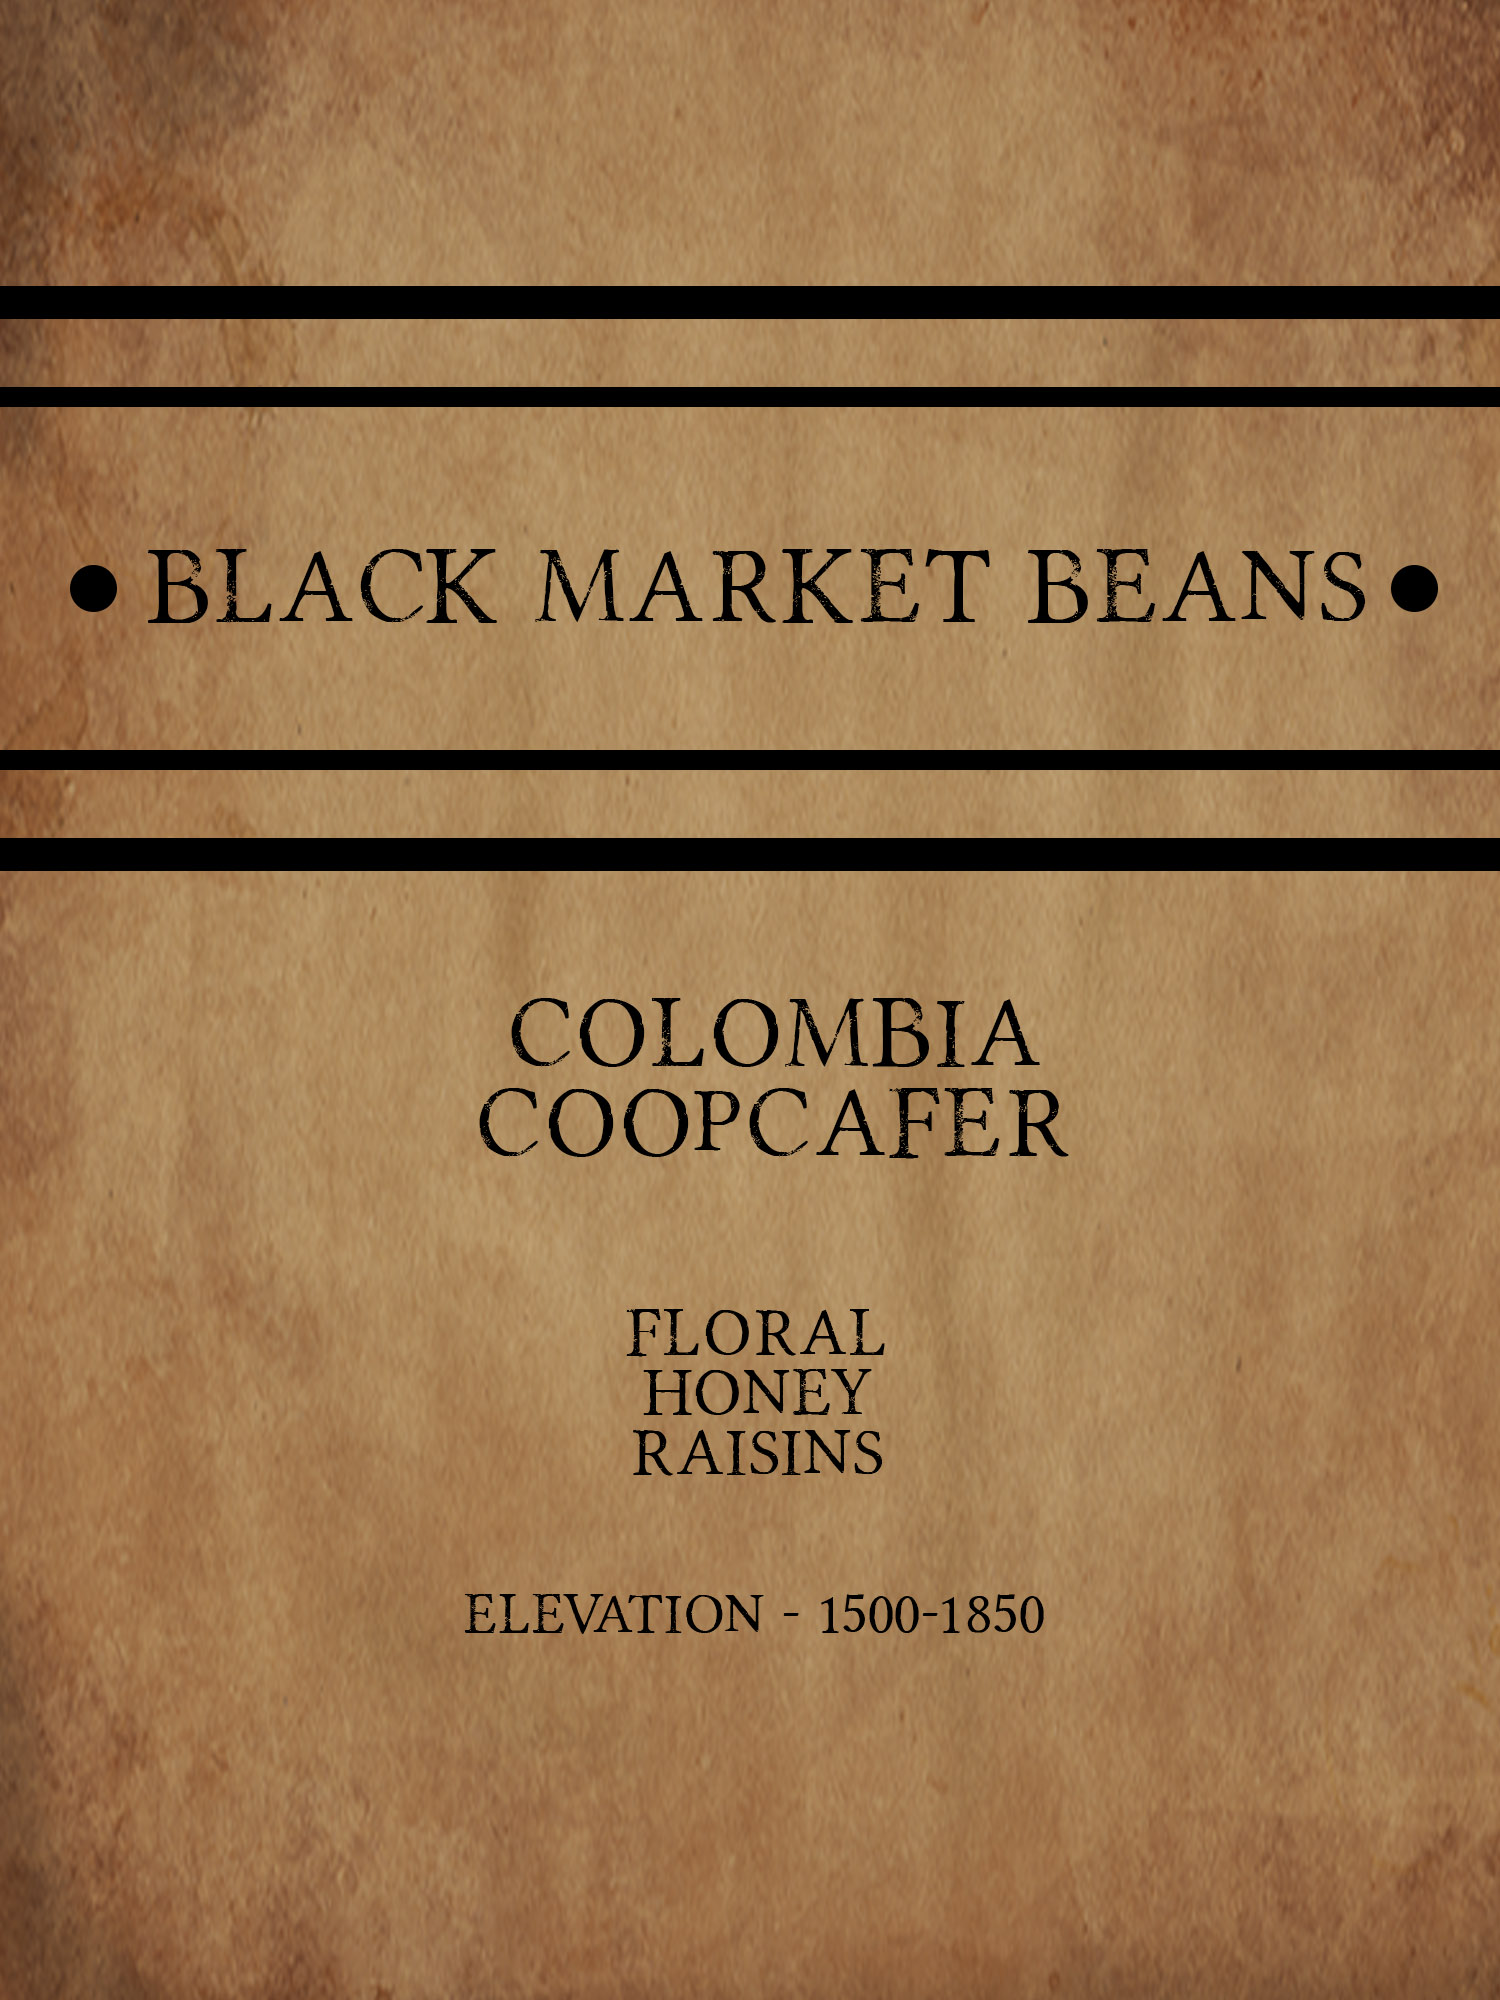 coffee_columbia_coopcafer.jpg